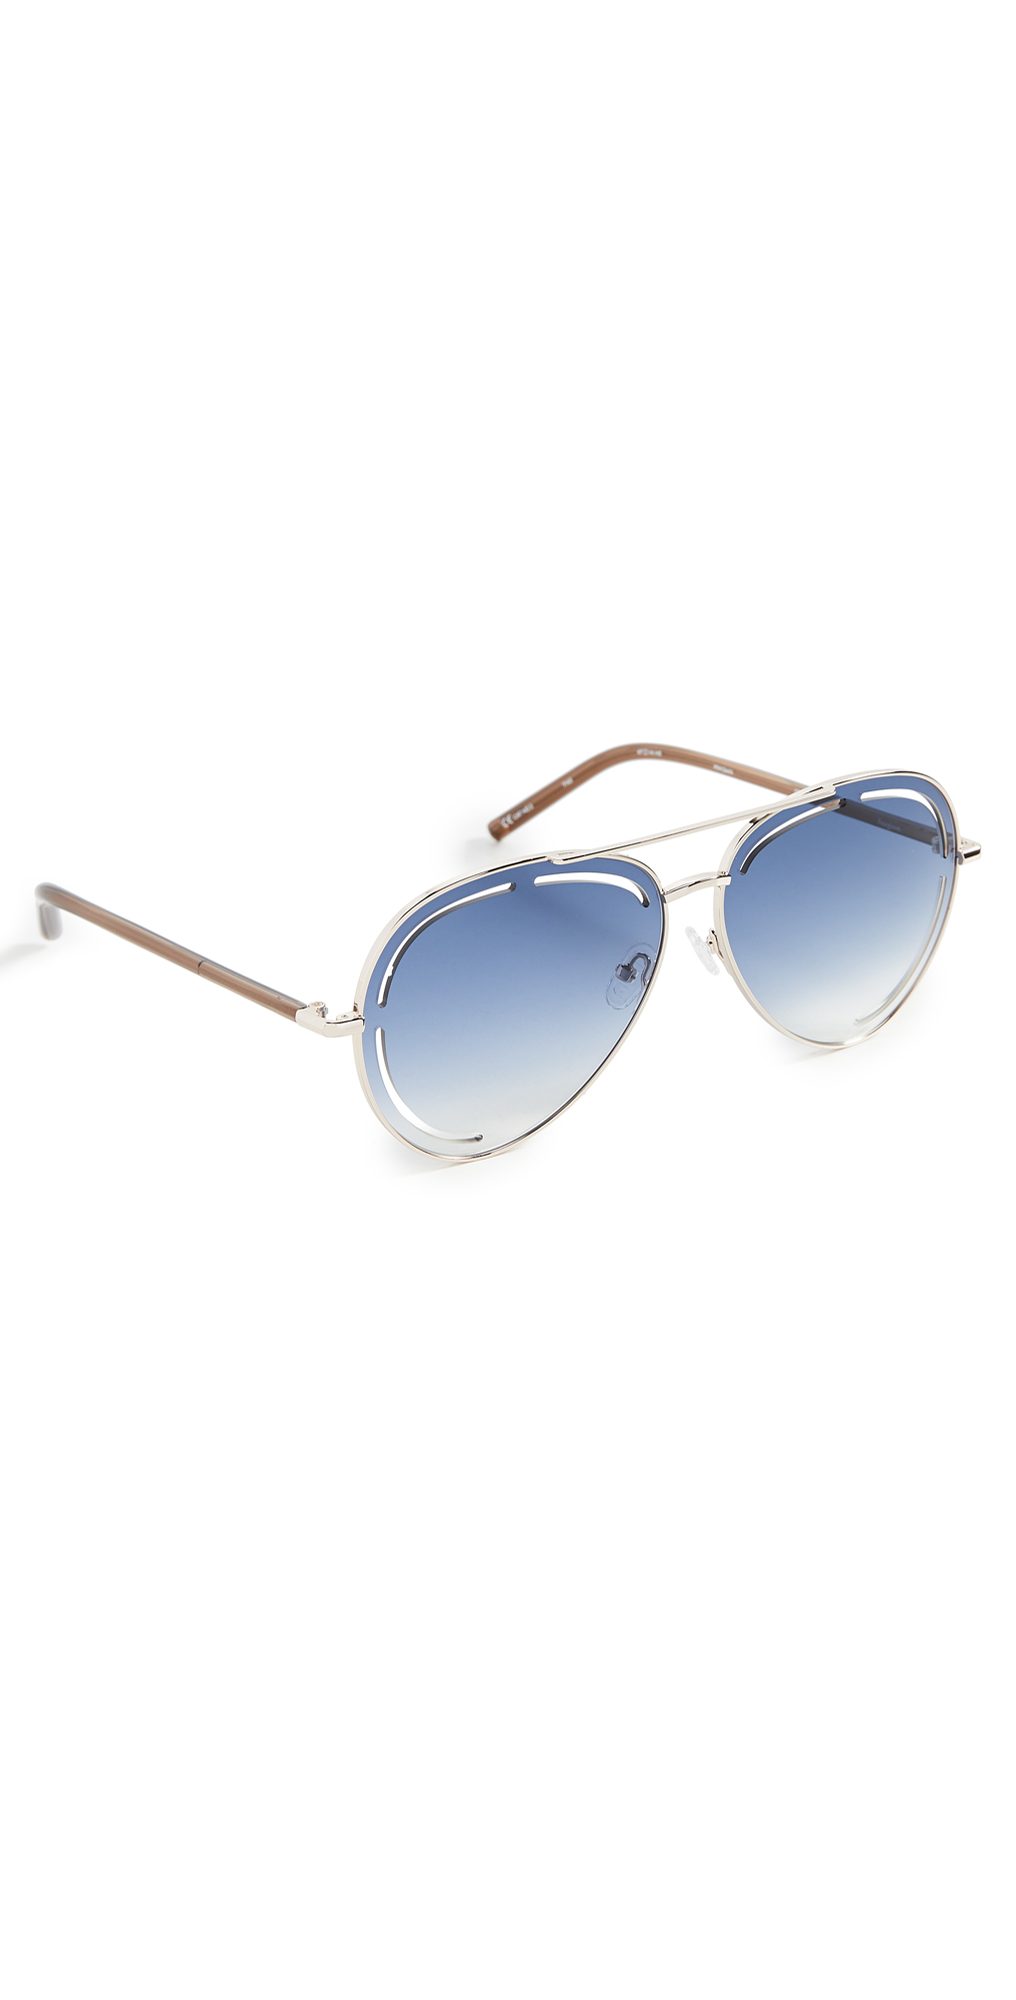 x Matthew Williamson Foxglove Sunglasses